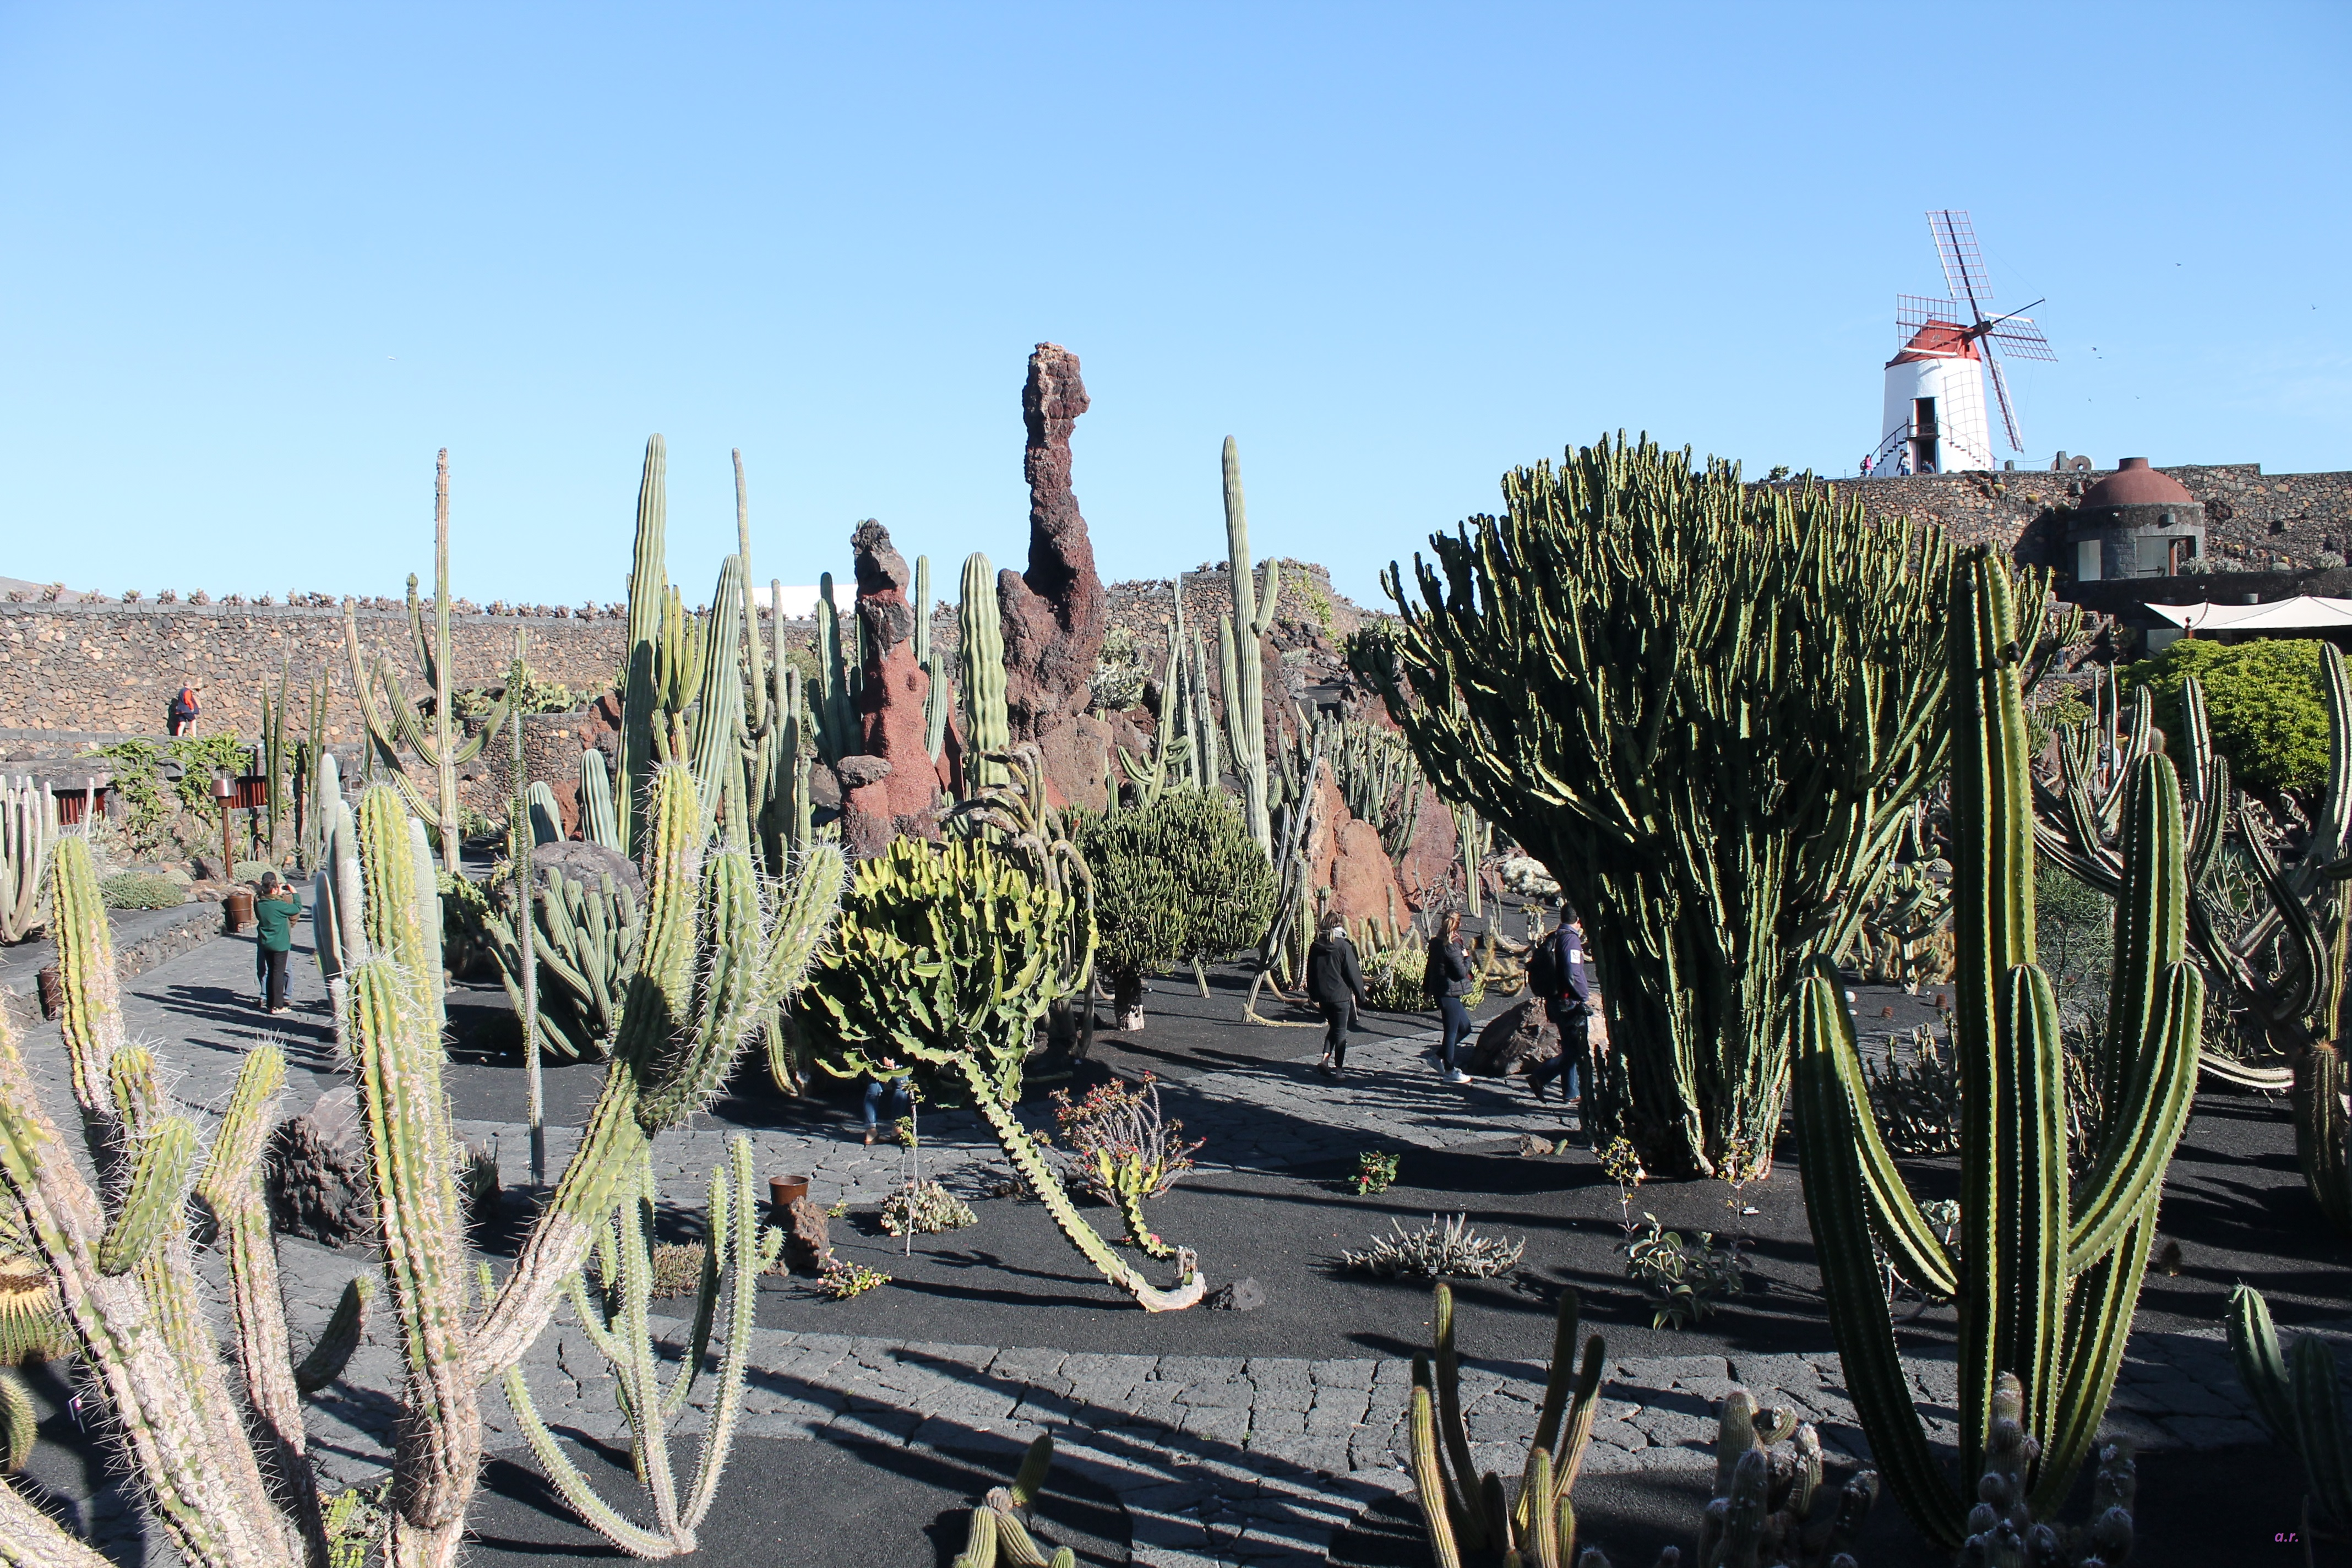 giardino dei Cactus ph. @poshbackpackers